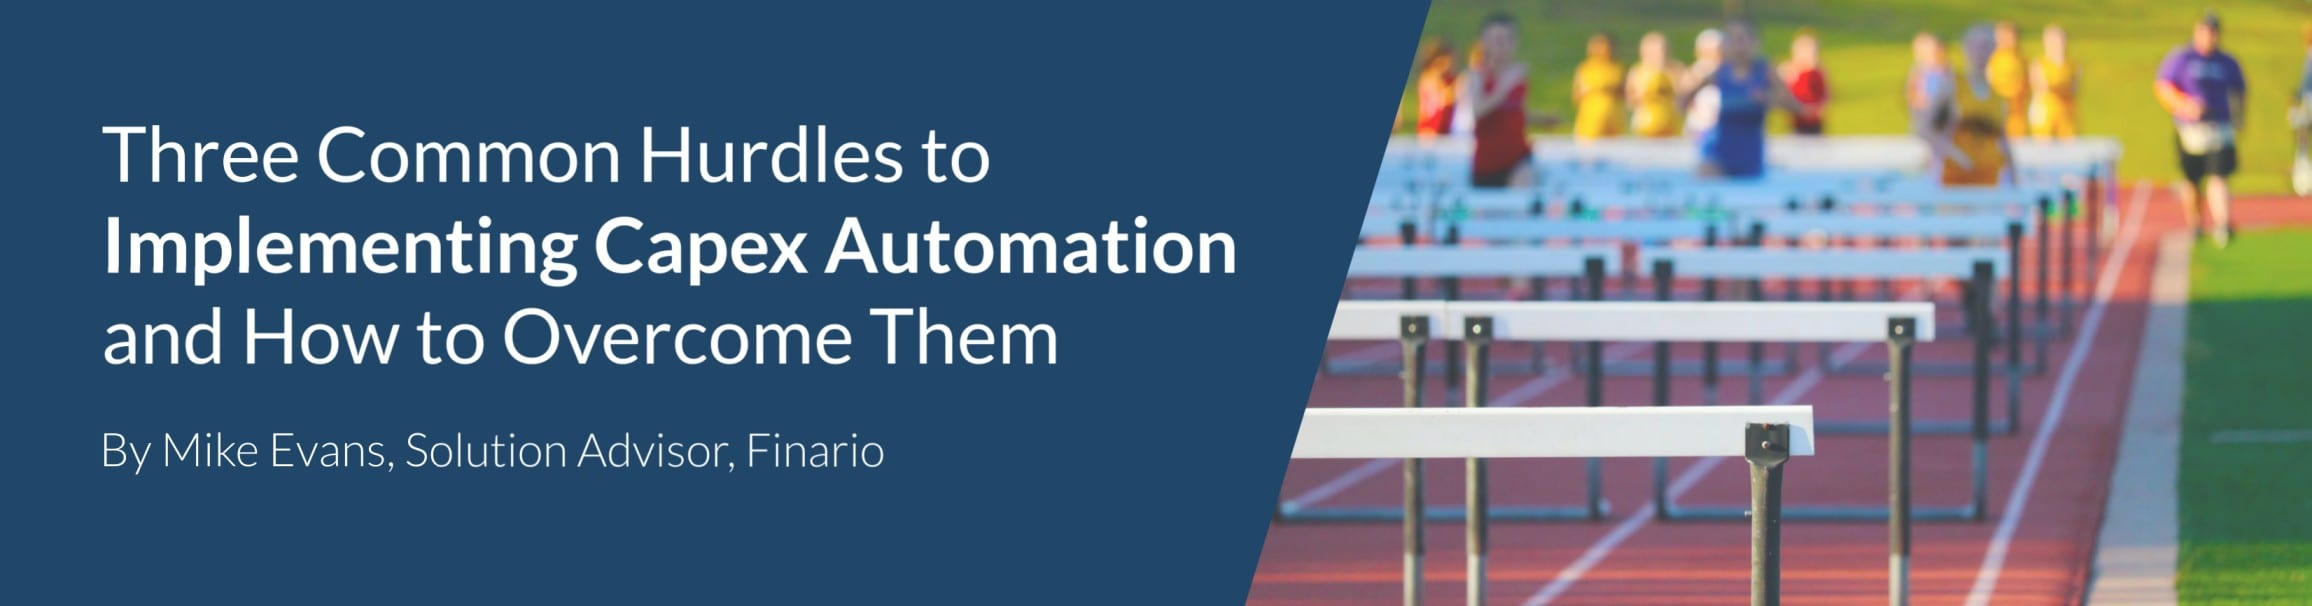 Capex Automation